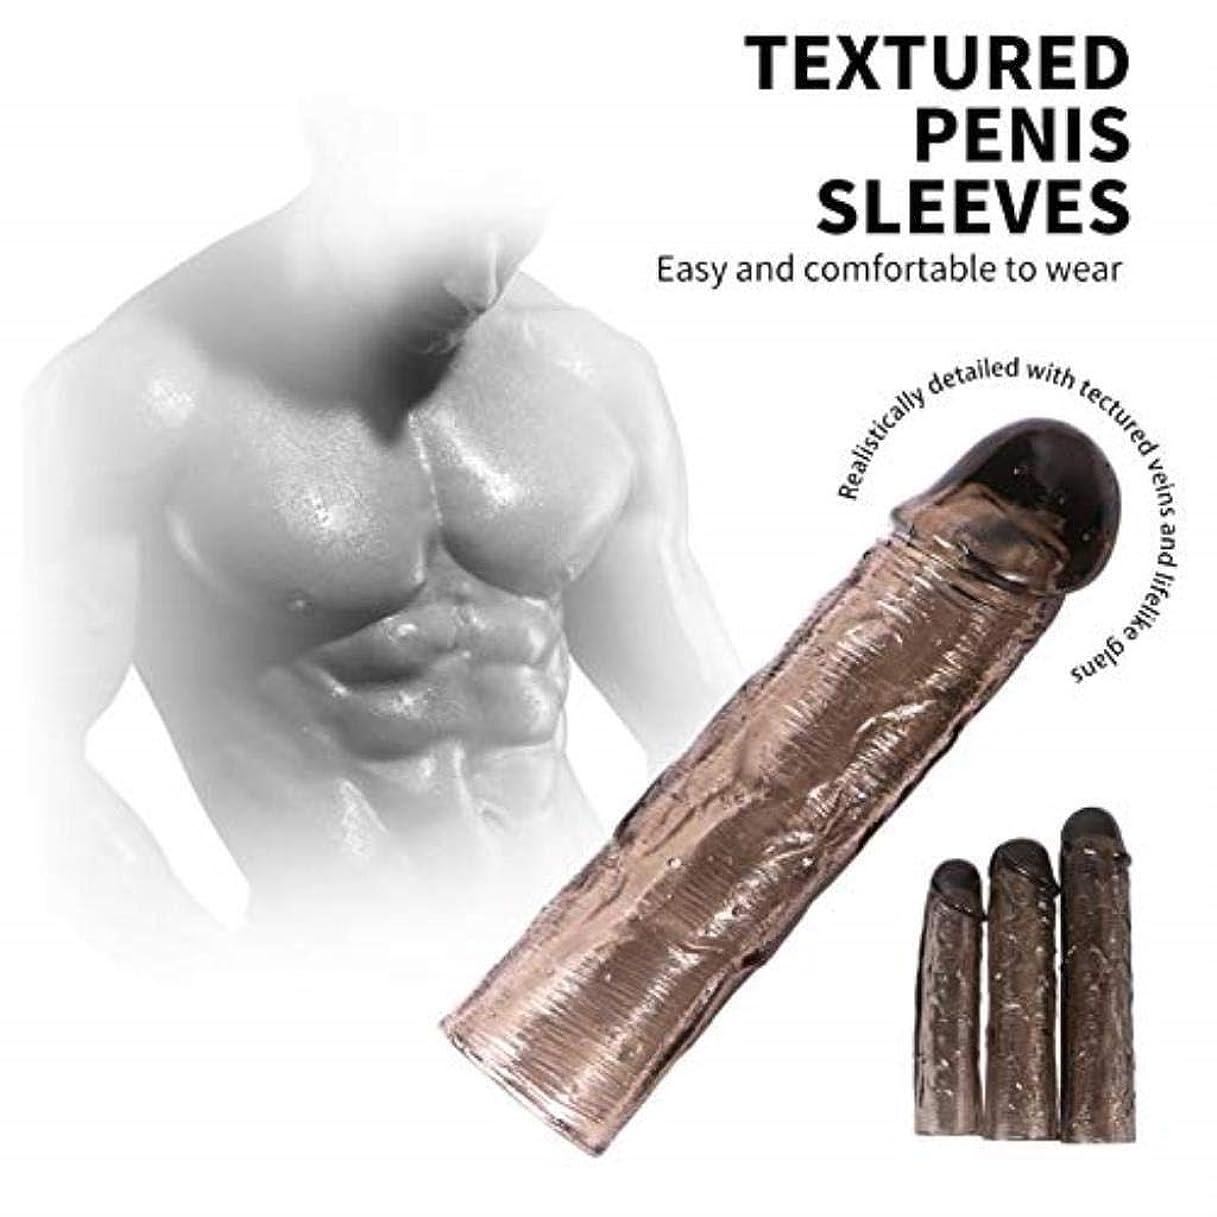 Zeezm素敵で魅力的な 男性とカップルのギフト用のサポートリング玩具付き男性用拡張拡張ペニの胴周り強化スリーブ 軽量